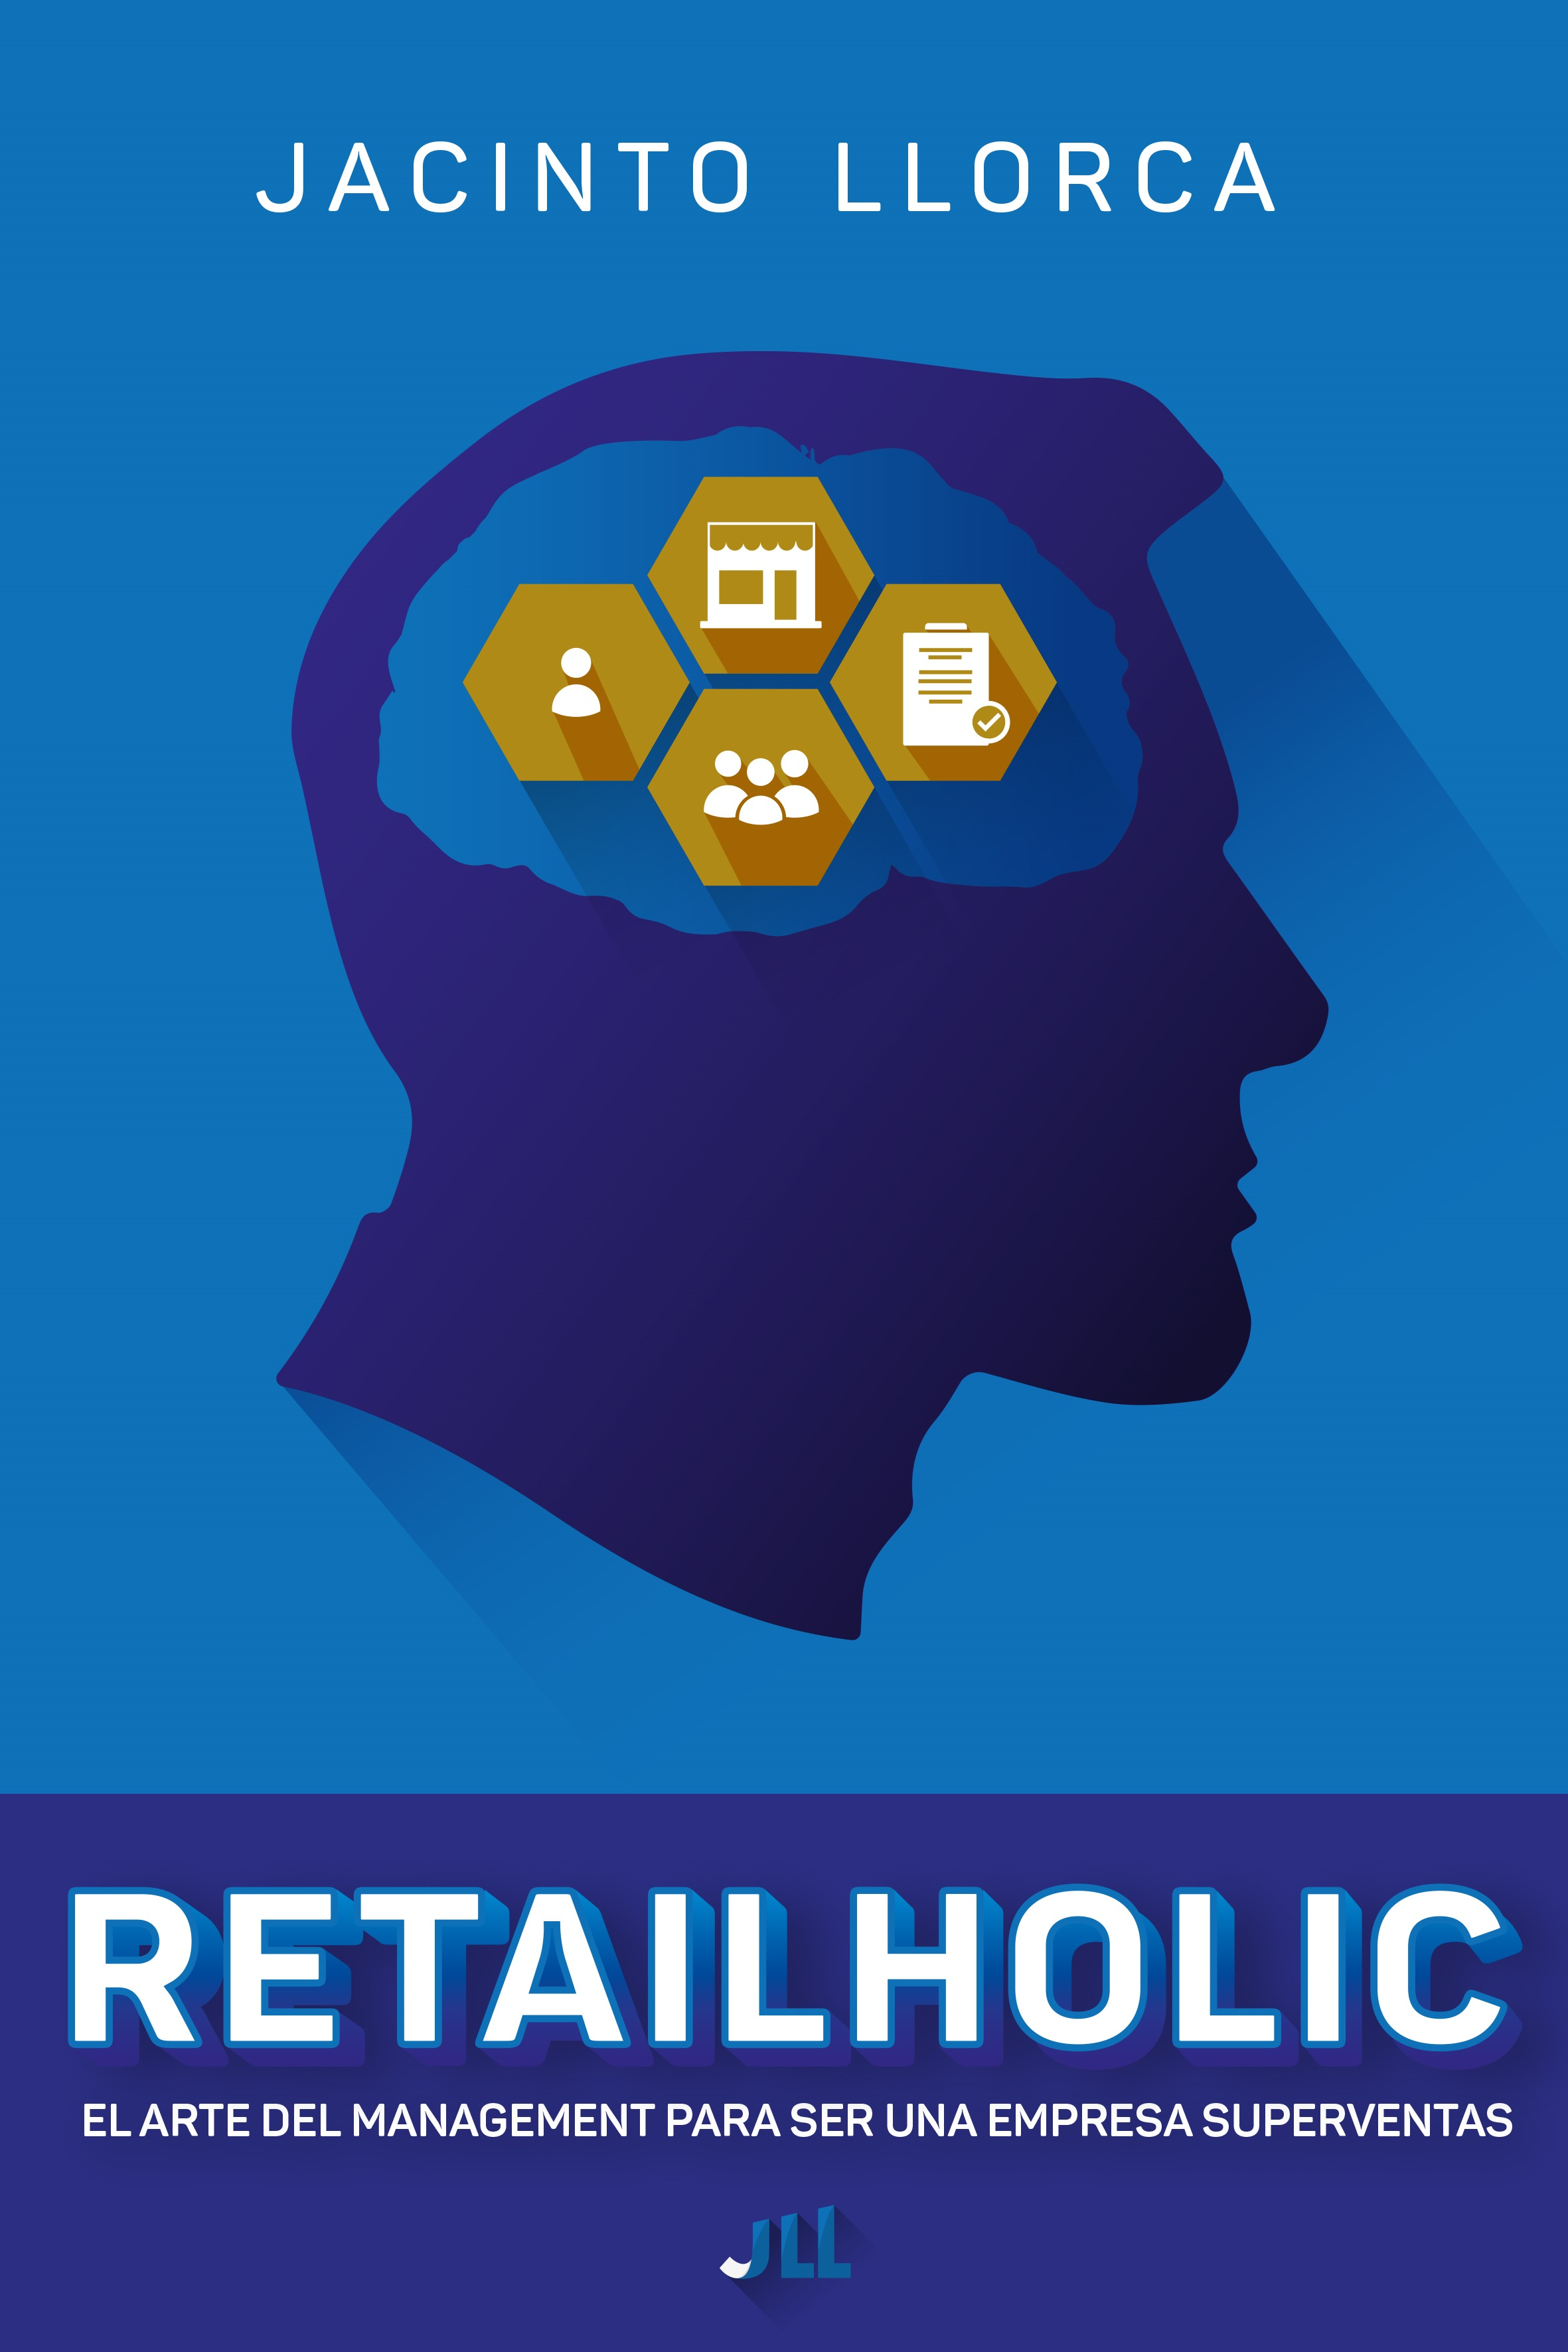 Retailholic. El arte del management para ser una empresa superventas